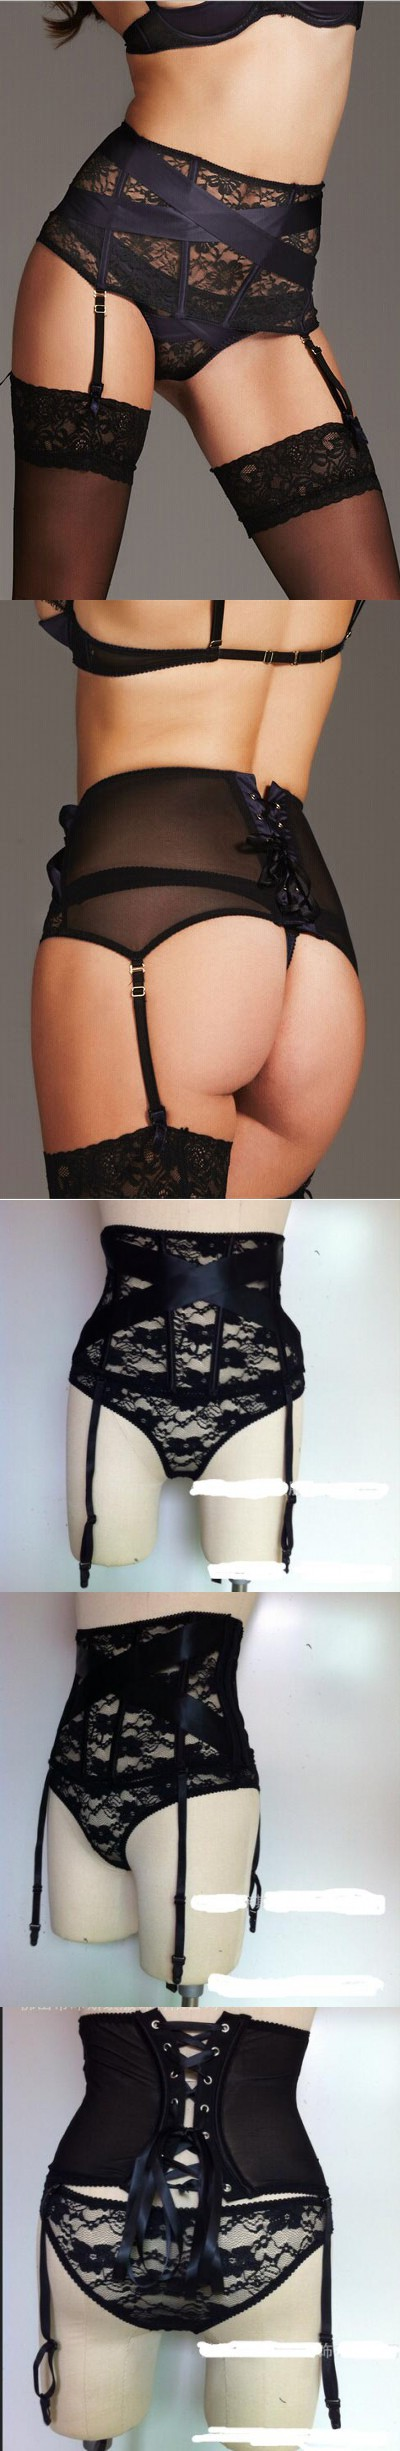 High Waist Garter Belt Women Black Floral Lace Garter Belt with Thong G-String Lingerie Set Sexy Liguero Stocking Suspender Belt